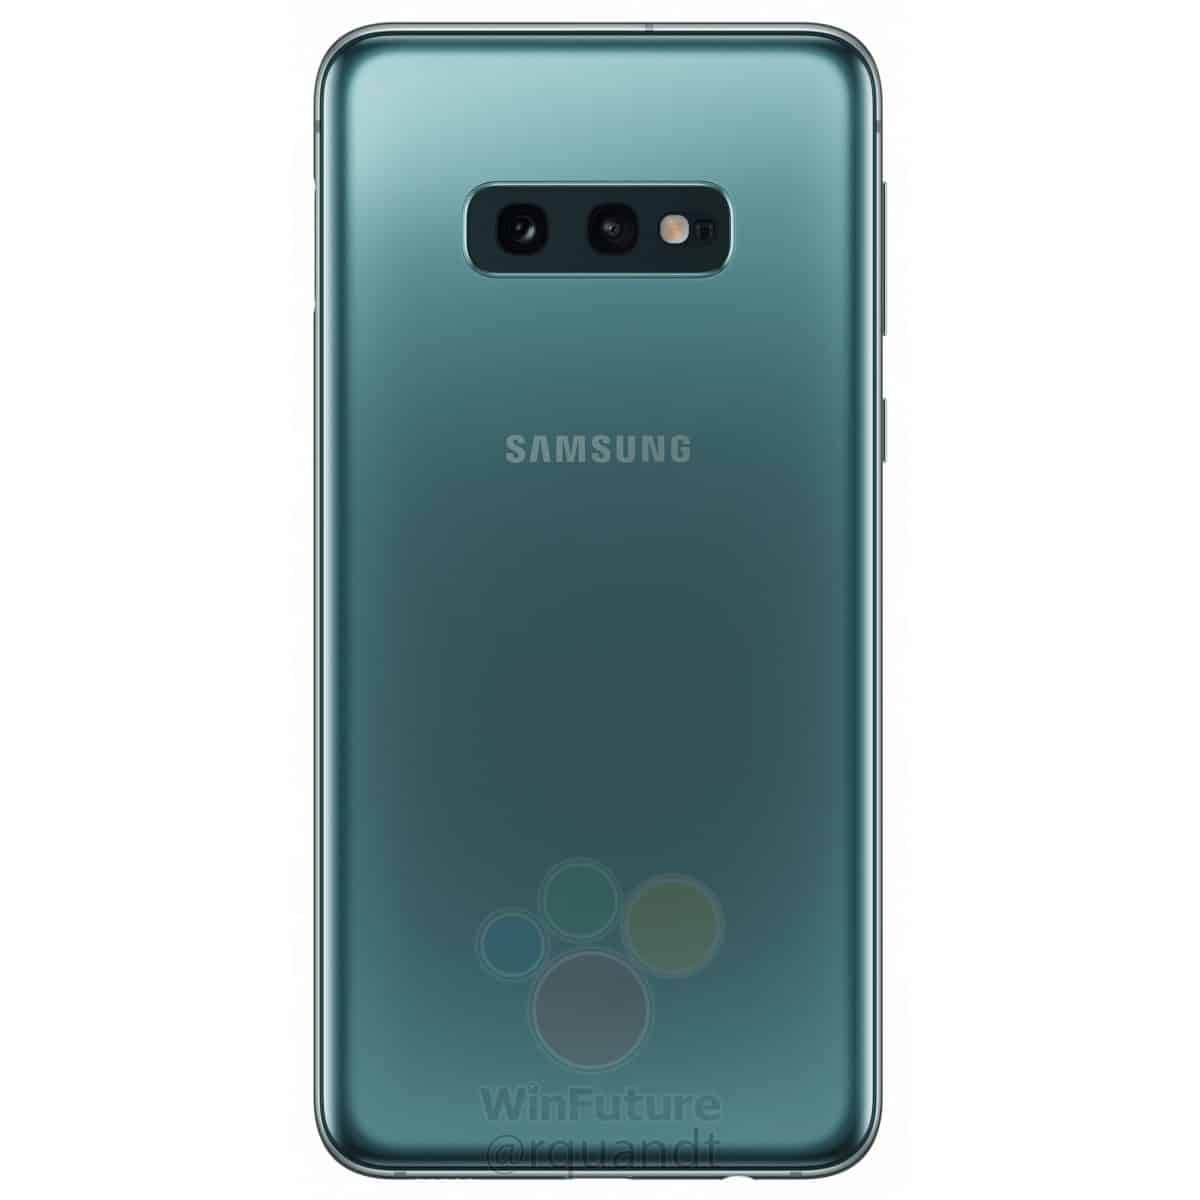 Samsung Galaxy S10e render leak 10